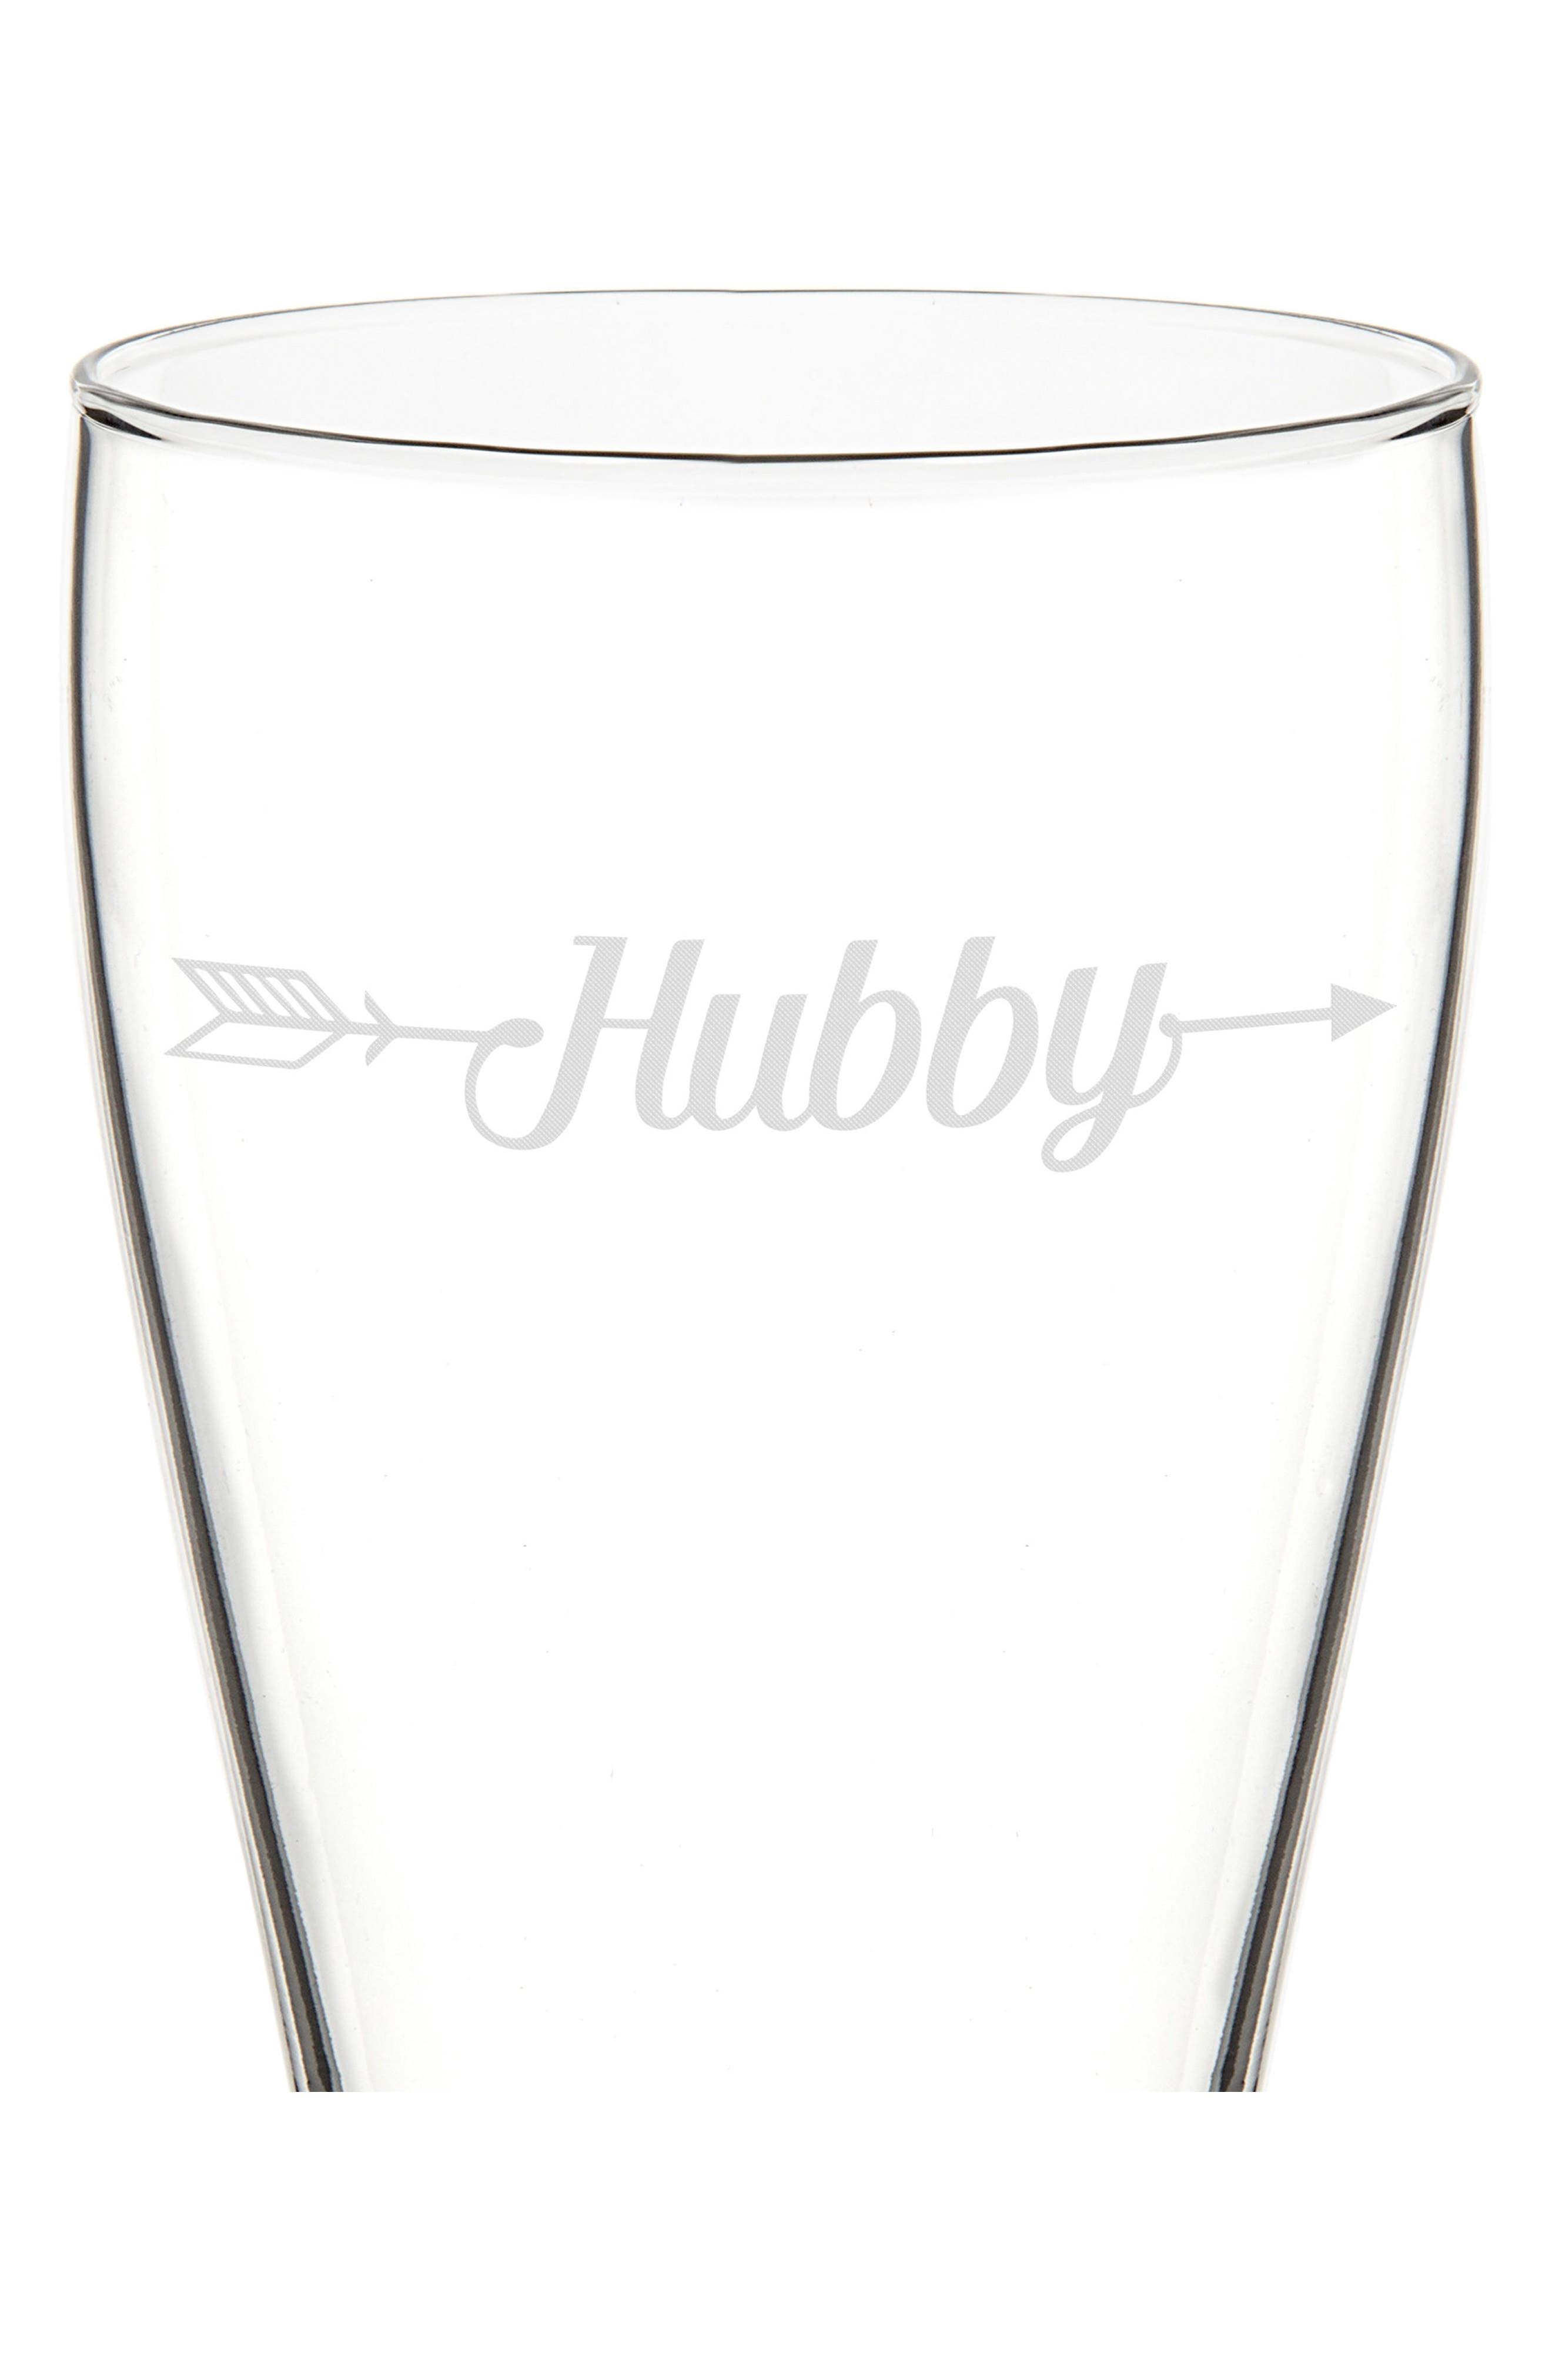 Hubby/Wifey Set of 2 Pilsner Glasses,                             Alternate thumbnail 6, color,                             100